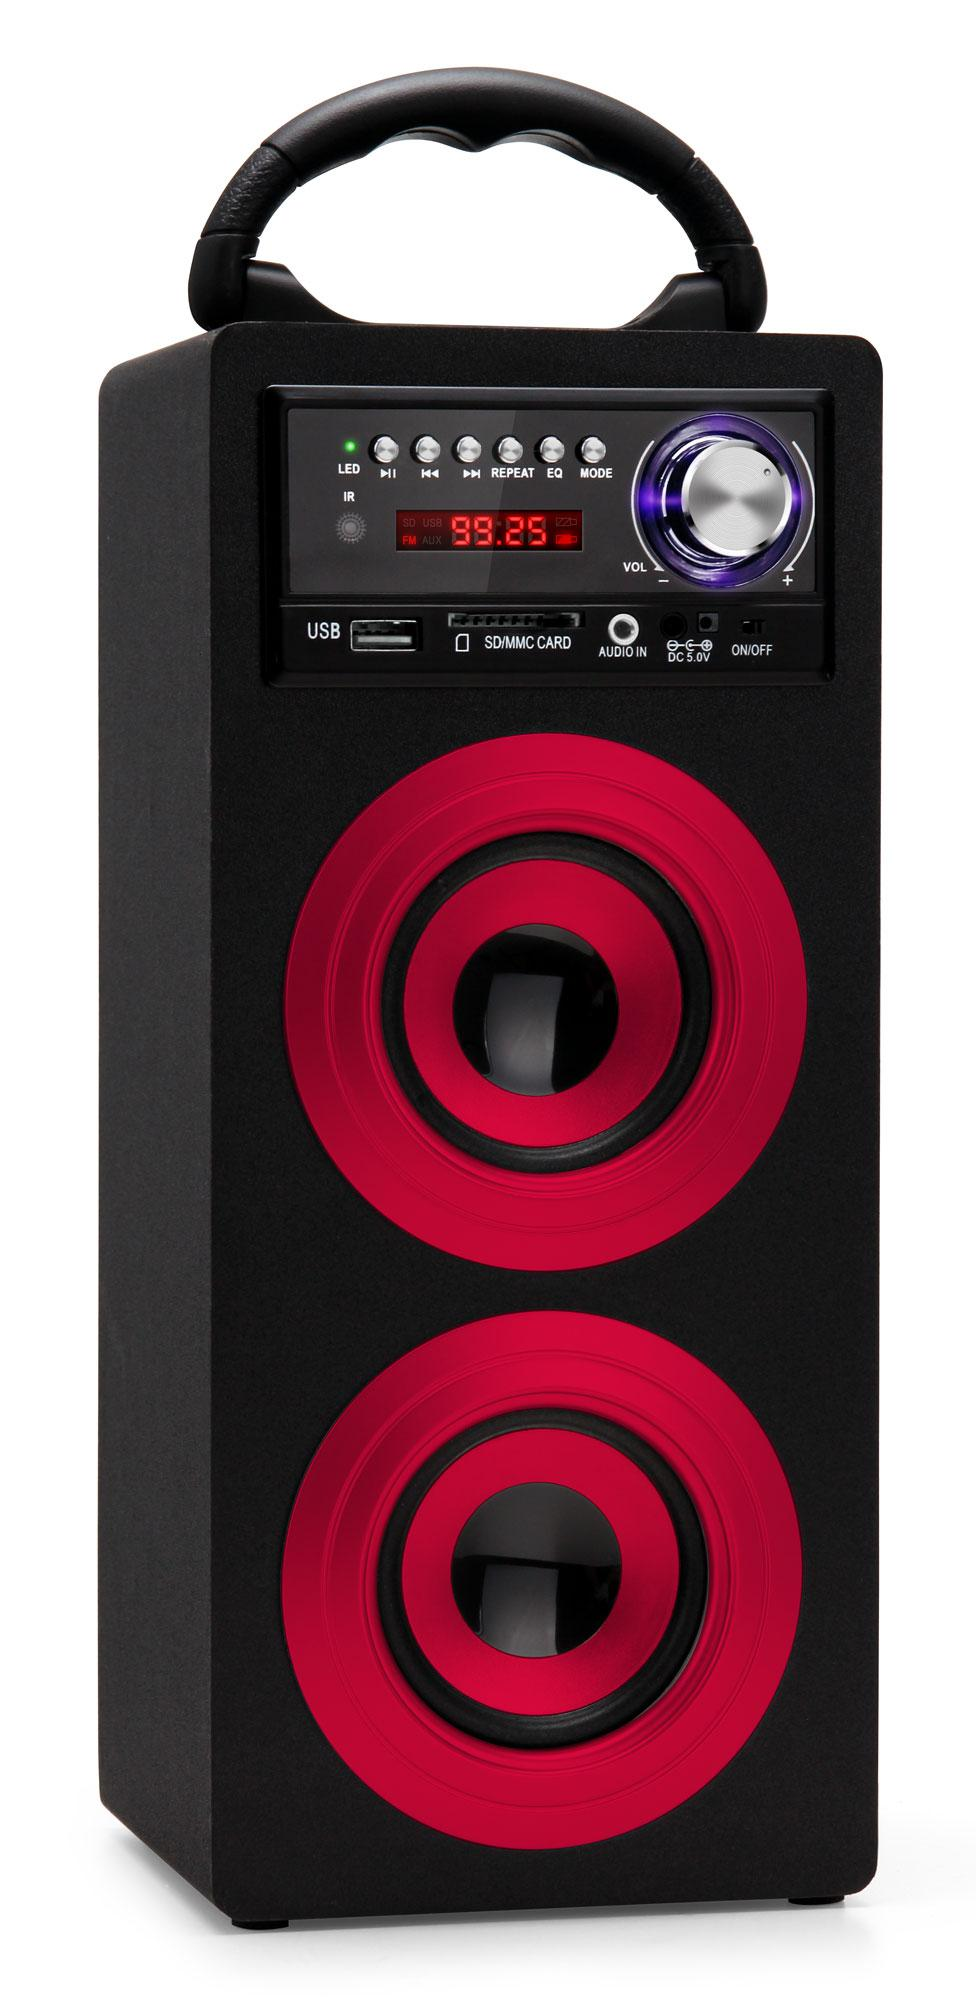 mobiler bluetooth lautsprecher mini stereo anlage usb sd aux mp3 player fm radio ebay. Black Bedroom Furniture Sets. Home Design Ideas